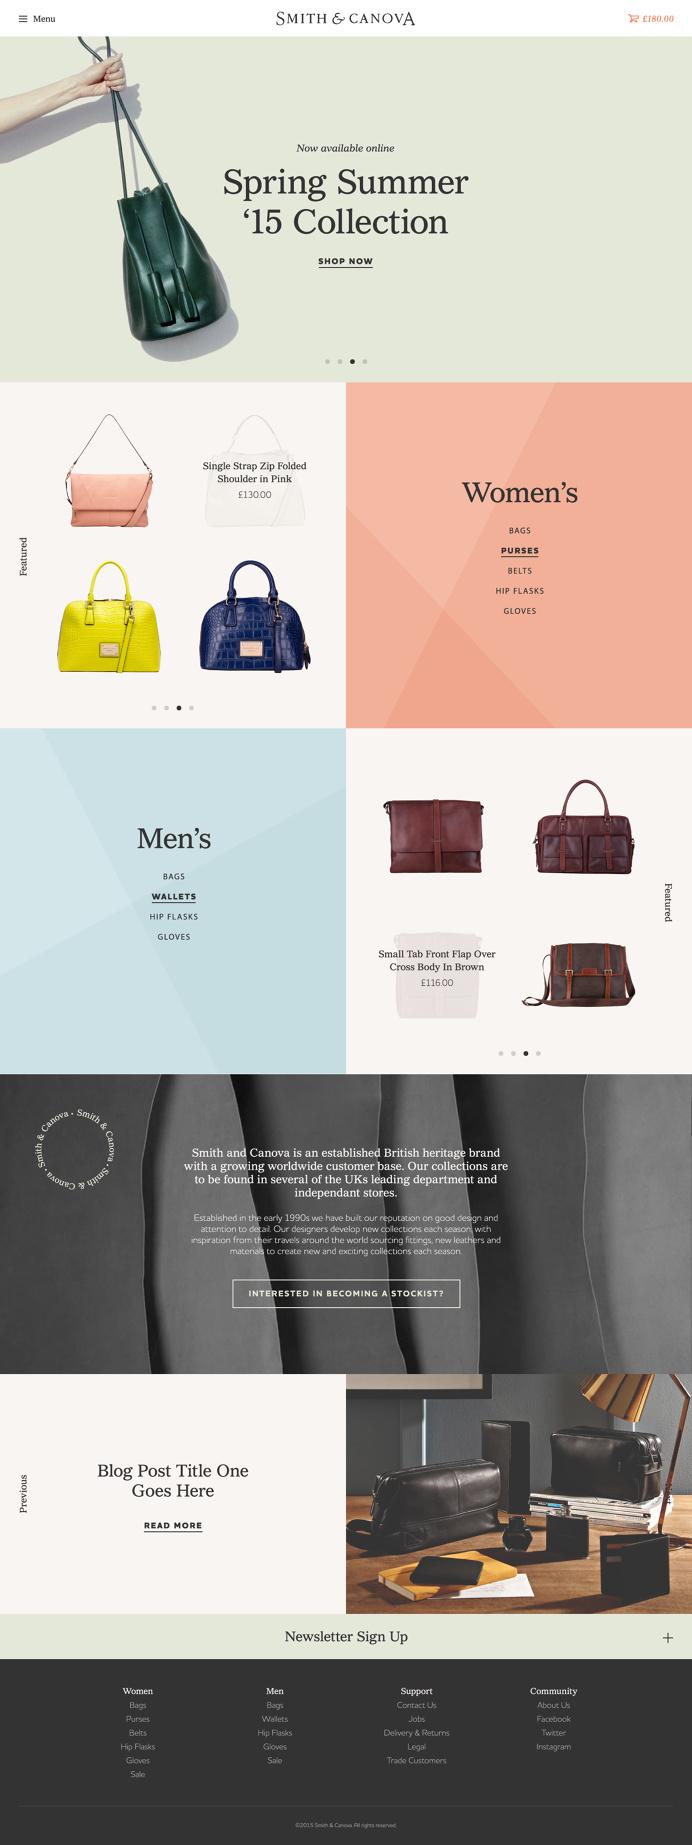 Homepage concept design for Smith & Canova #website #homepage #webdesign